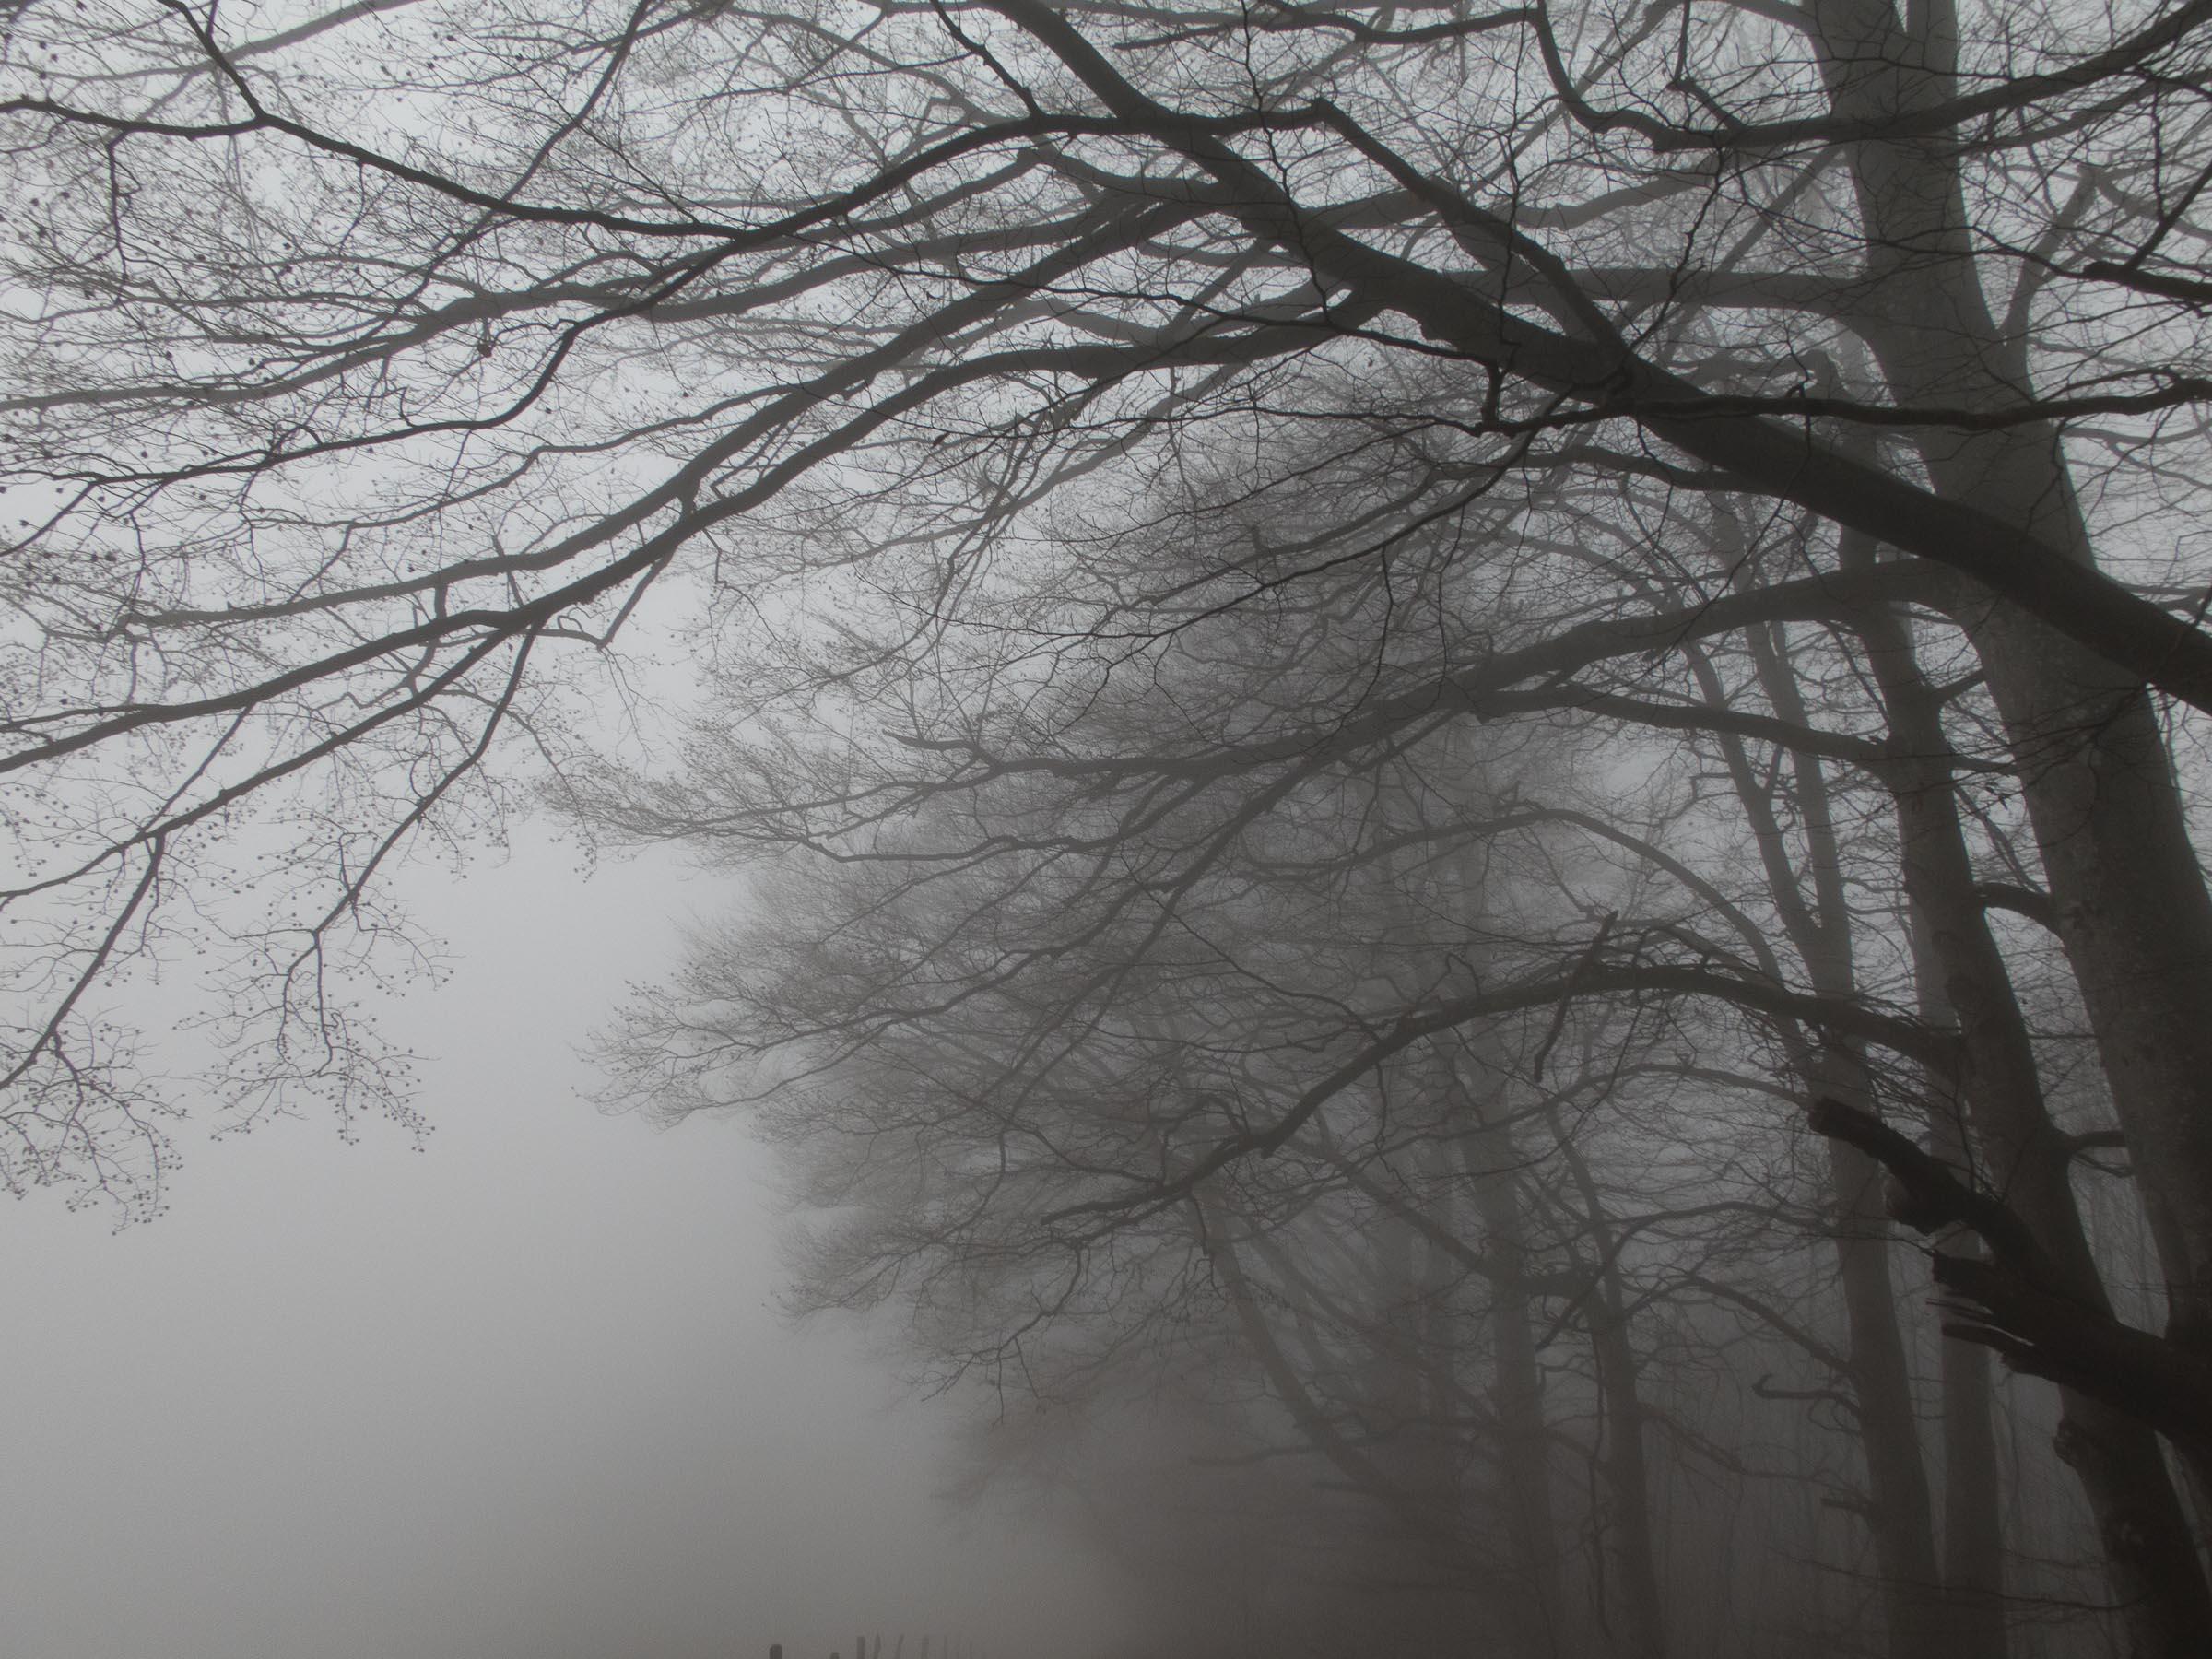 181216_Nebel_Wald_053